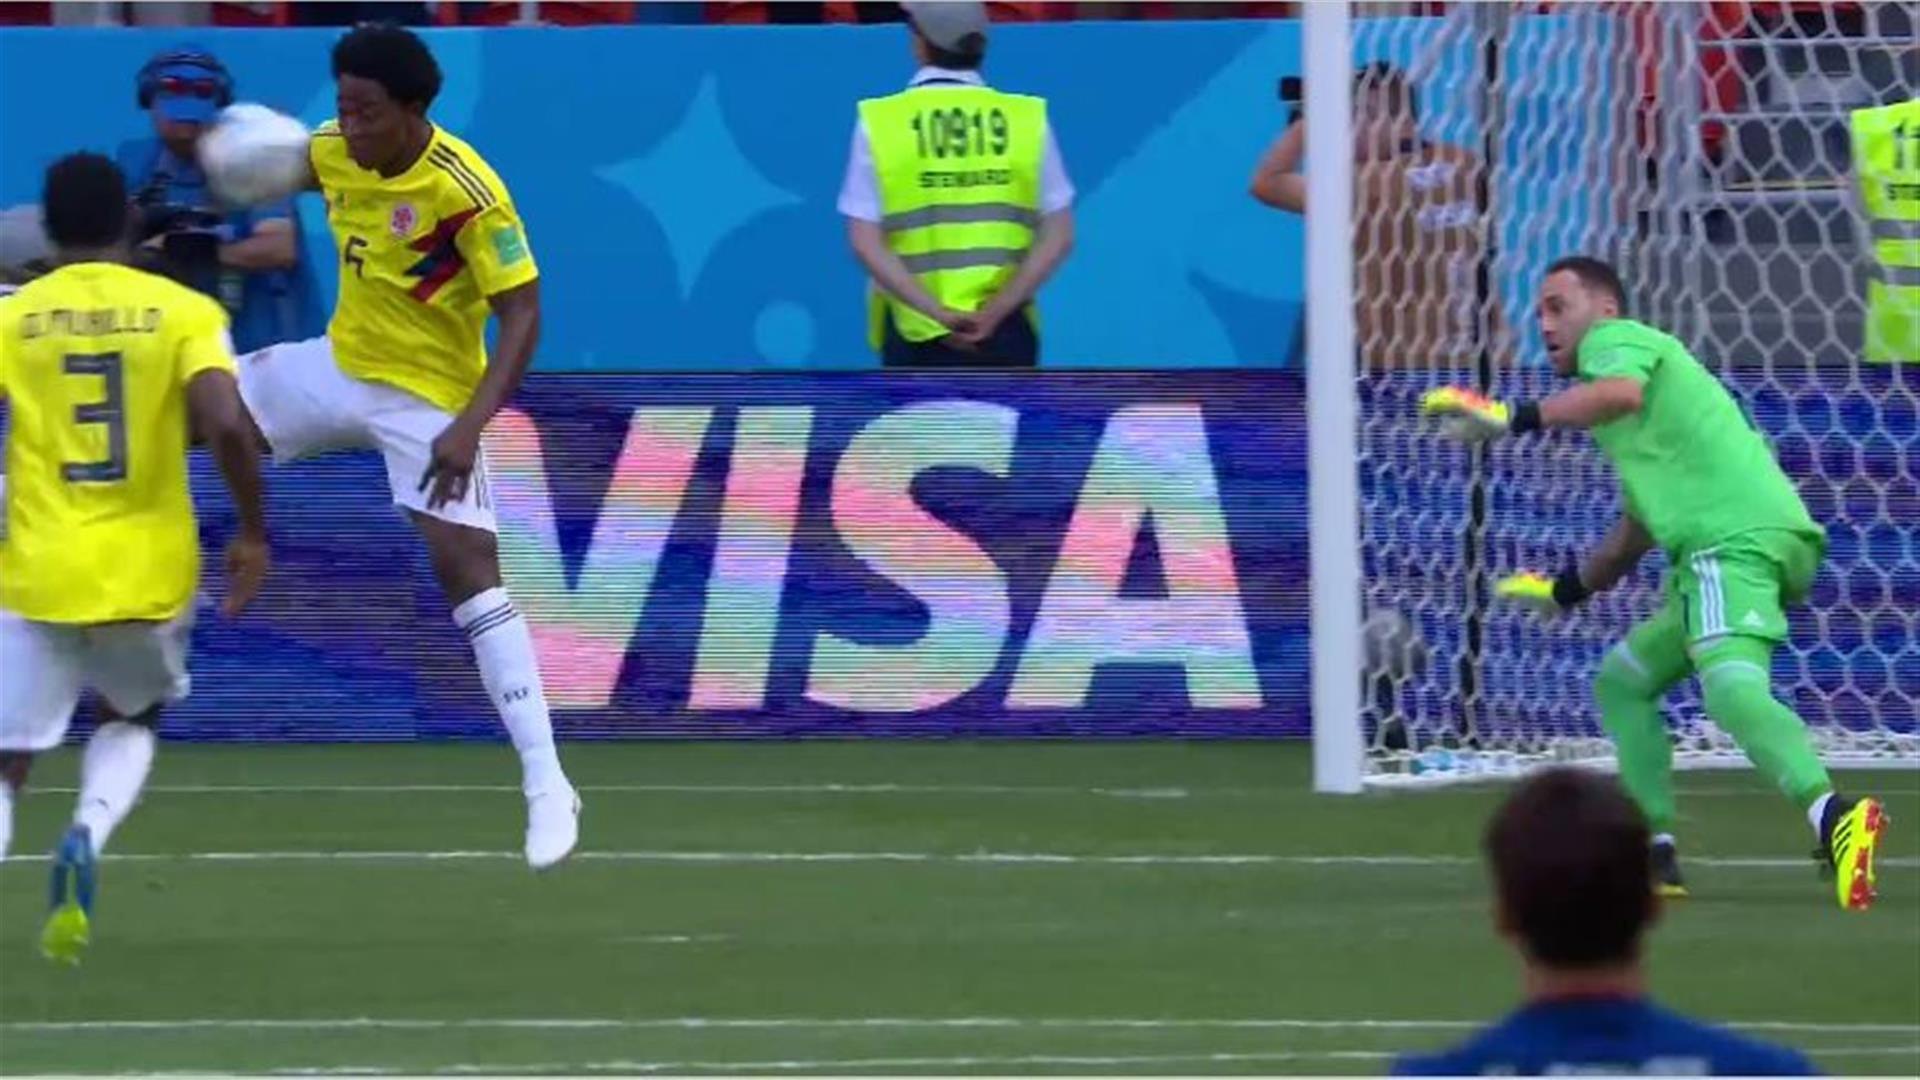 Rote Karte Wm 2018.Gruppe H Kolumbien Japan 1 2 Fifa Wm 2018 Zdfmediathek